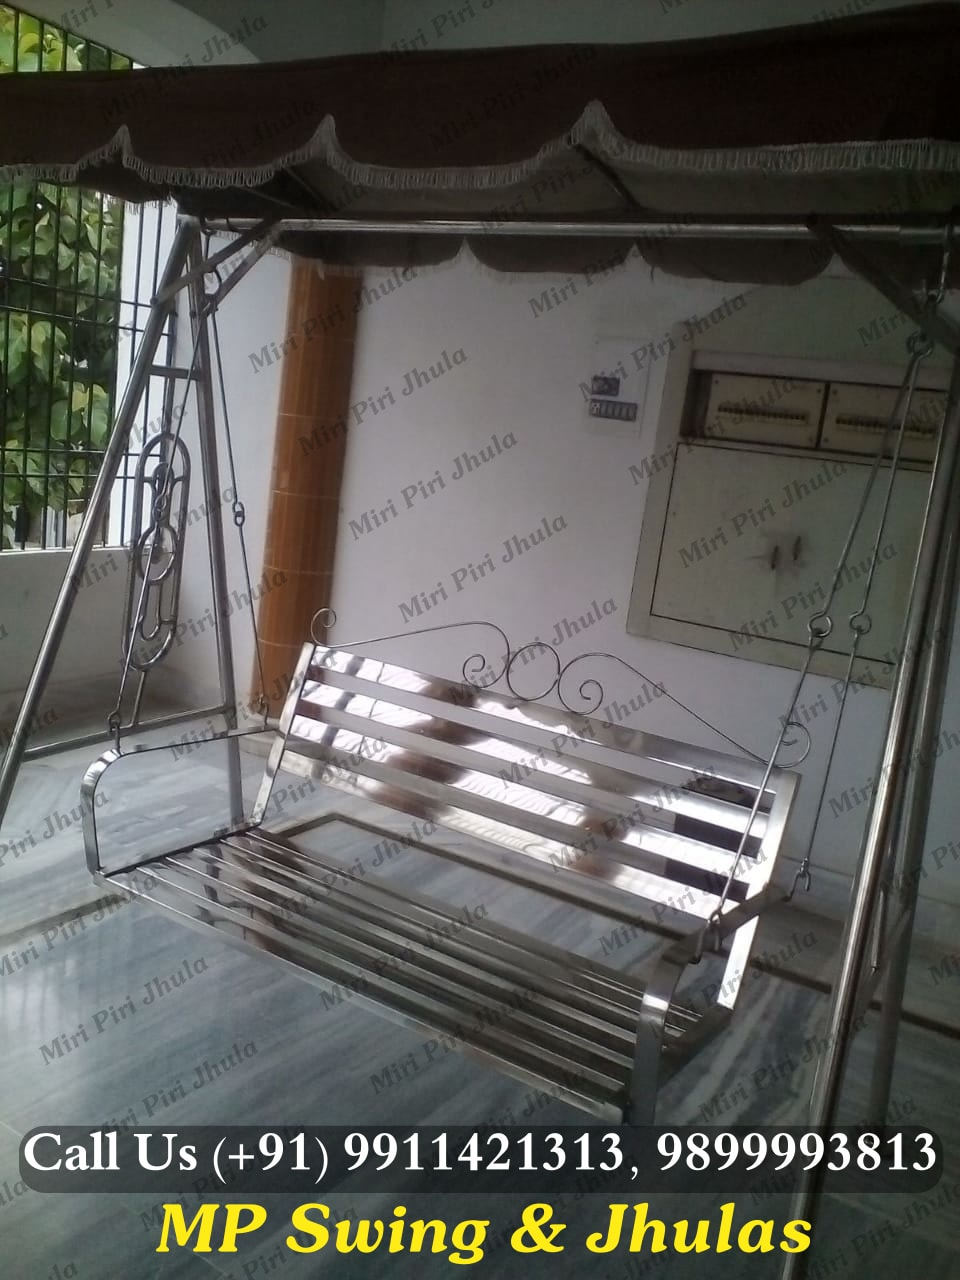 Stainless Steel Home Swing Jhulas